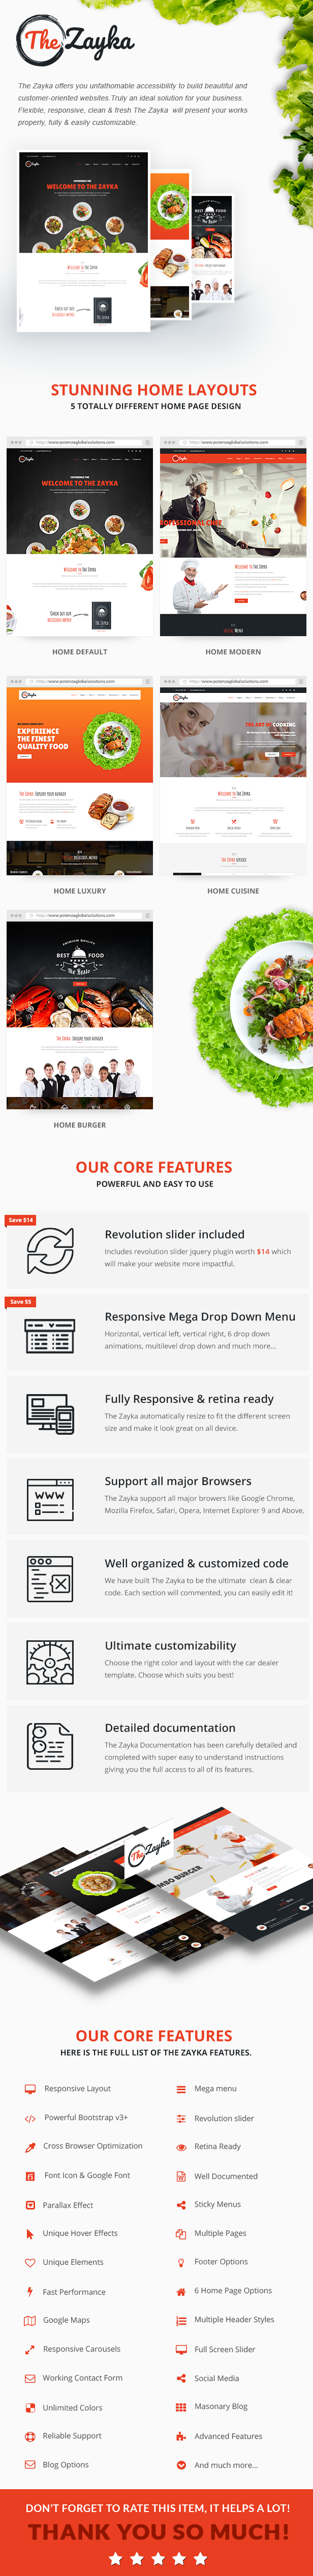 The Zayka - Multipurpose Restaurant, Food & Cafe HTML5 Template - 2